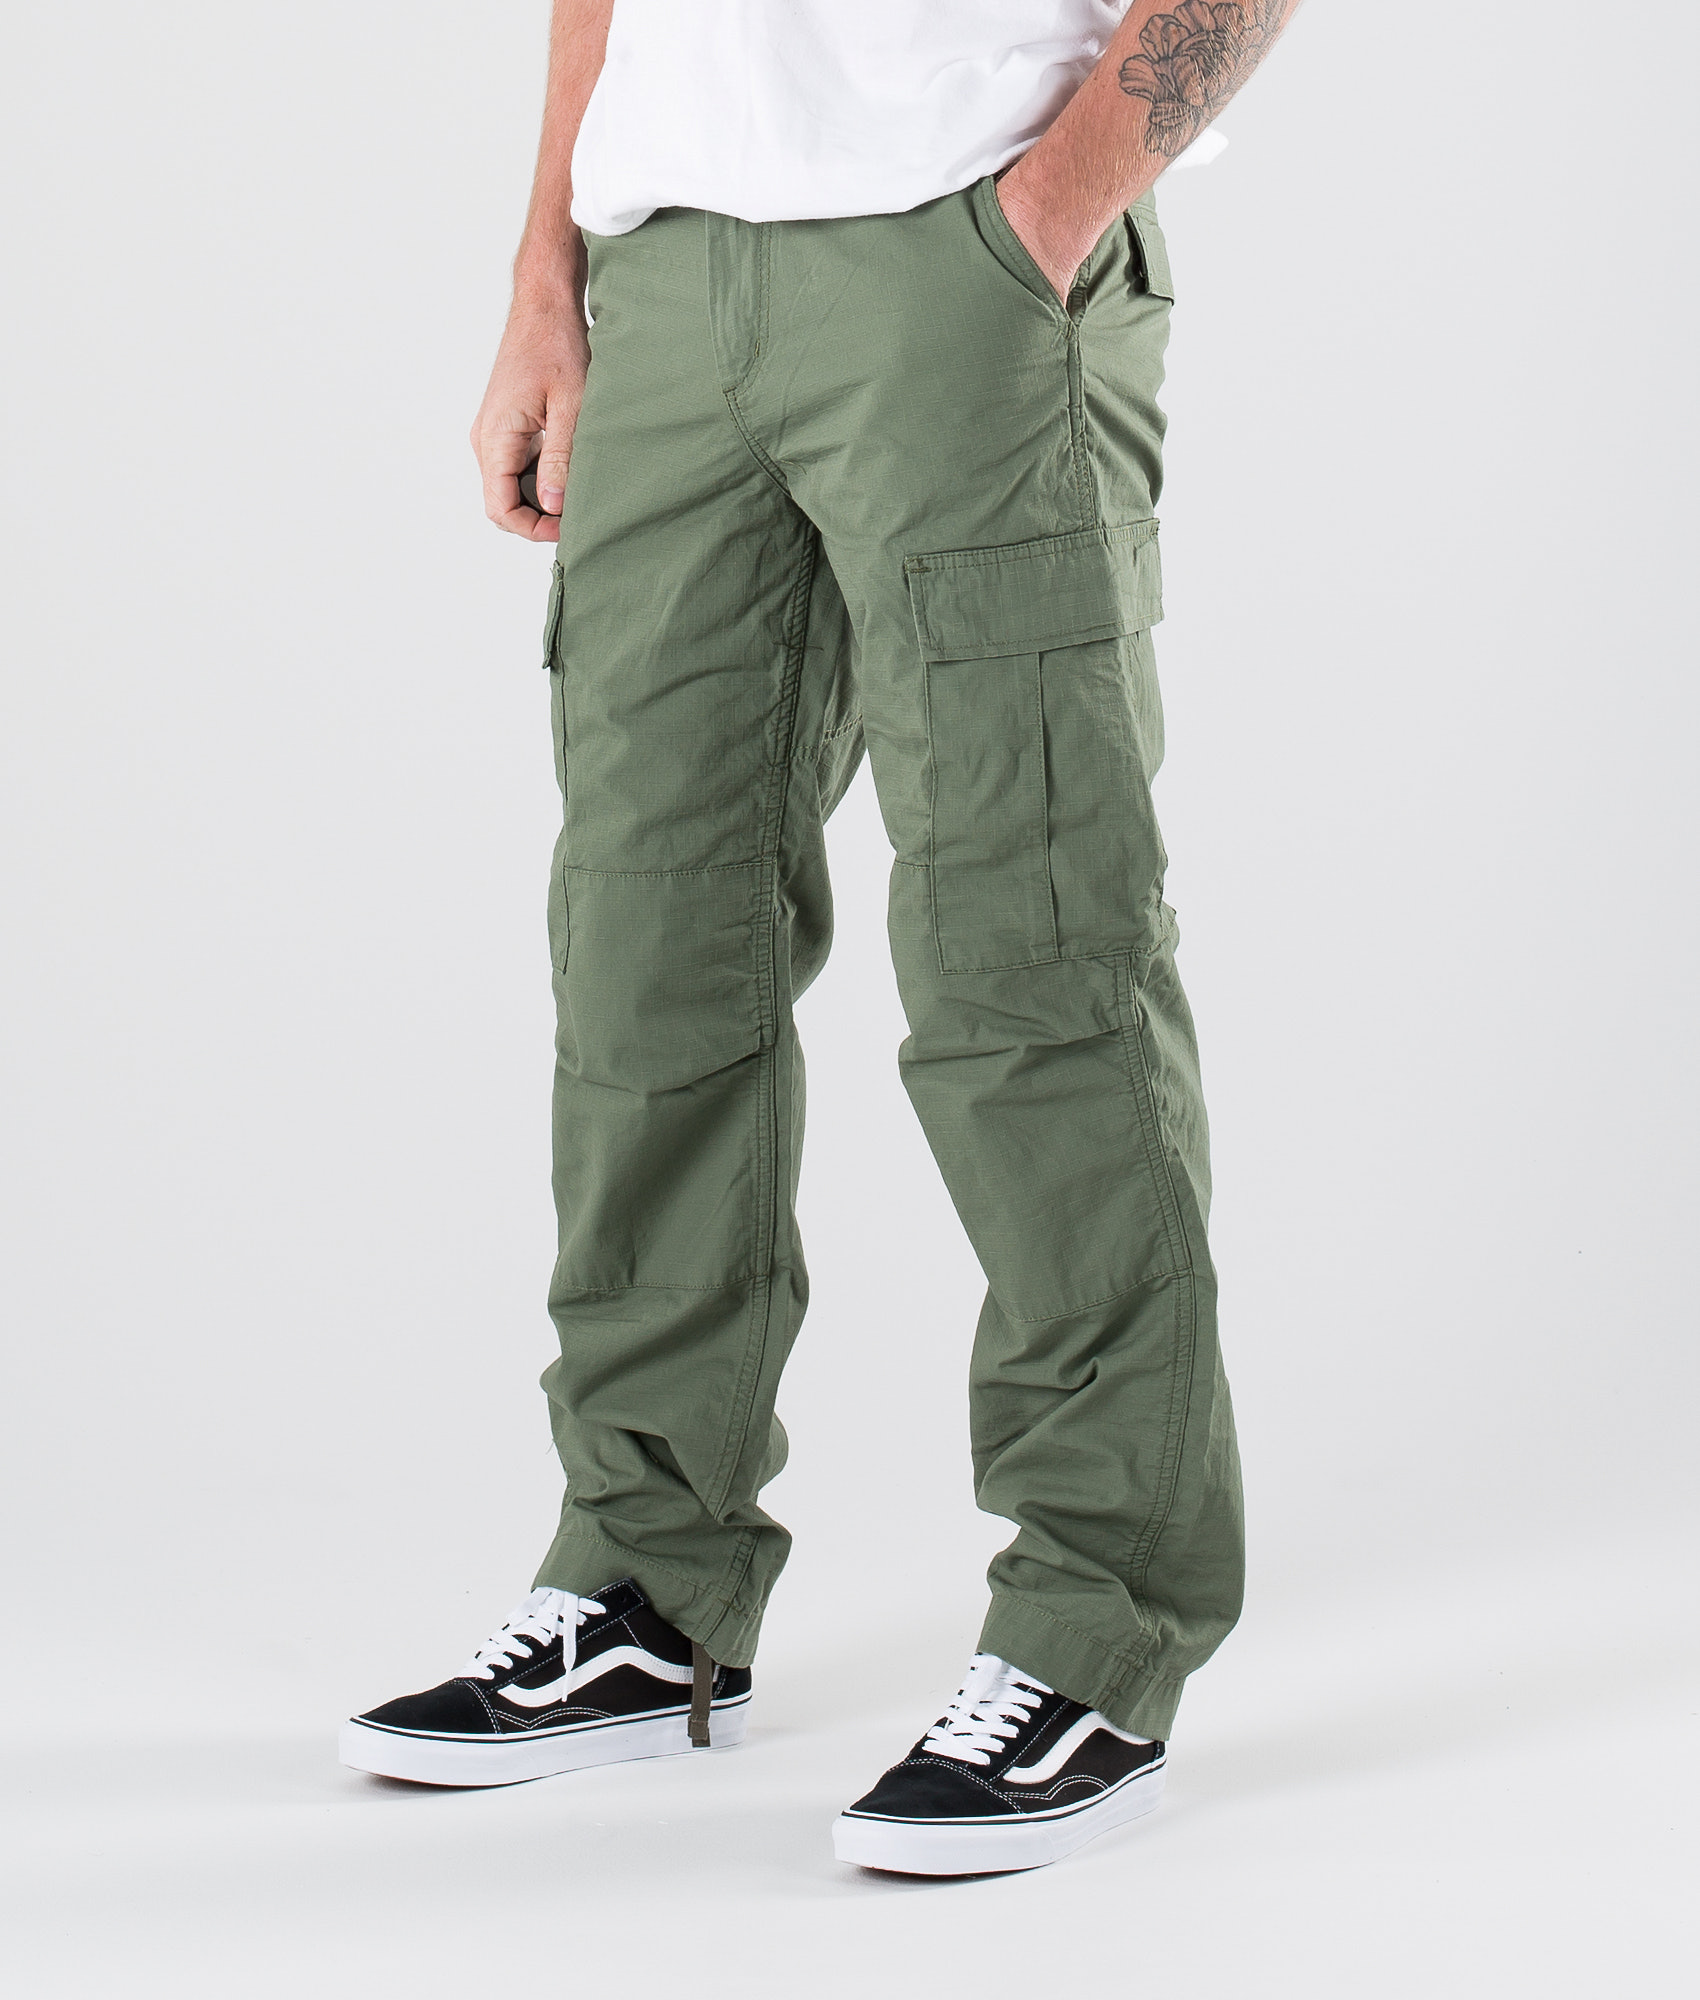 5b08266d Men's Streetwear Pants | Free Delivery | RIDESTORE